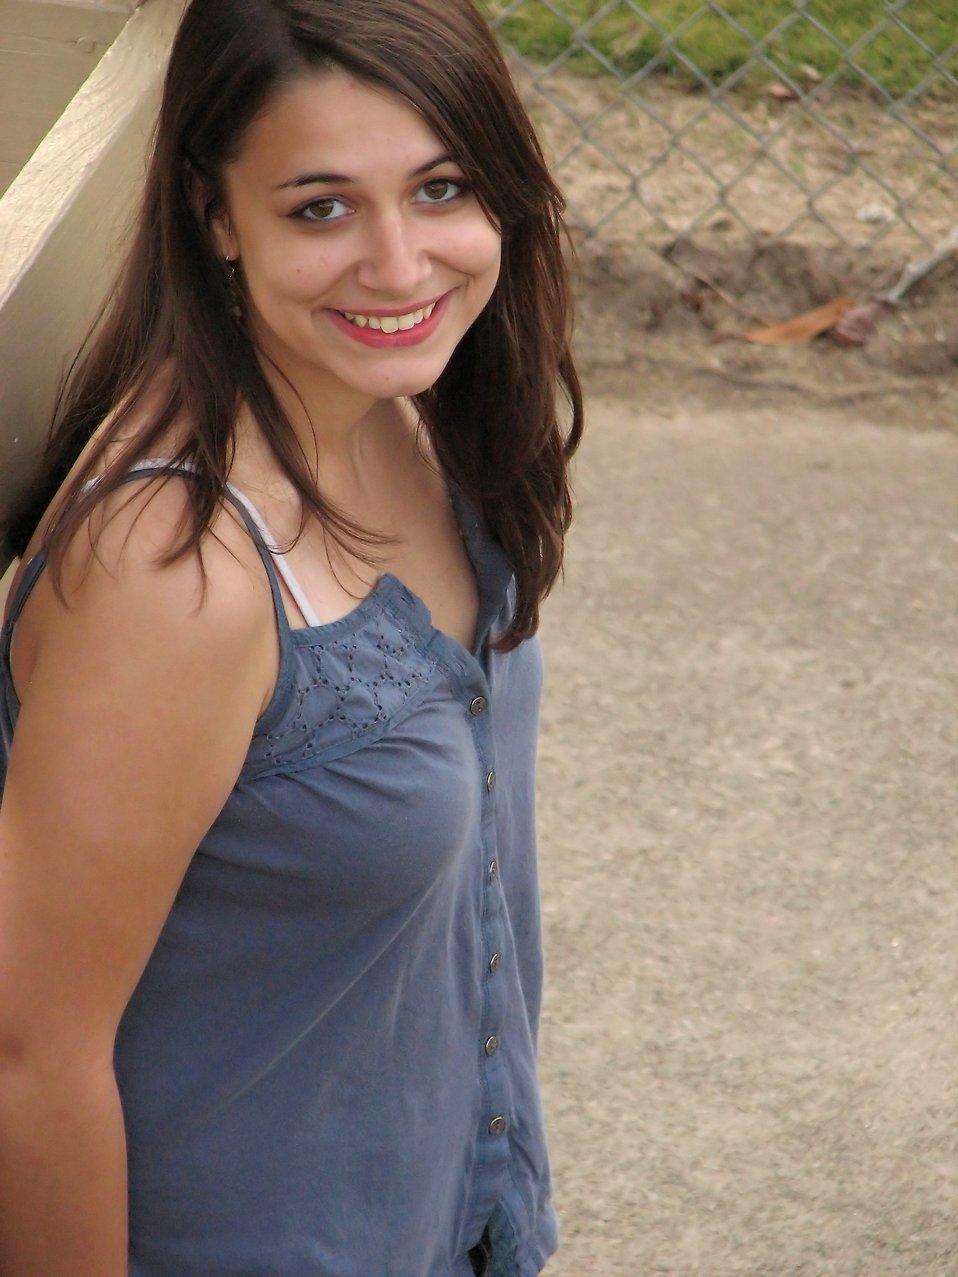 Girl Beautiful | Free Stock Photo | Outdoor portrait of a ... on Beautiful Teen Girl  id=68721